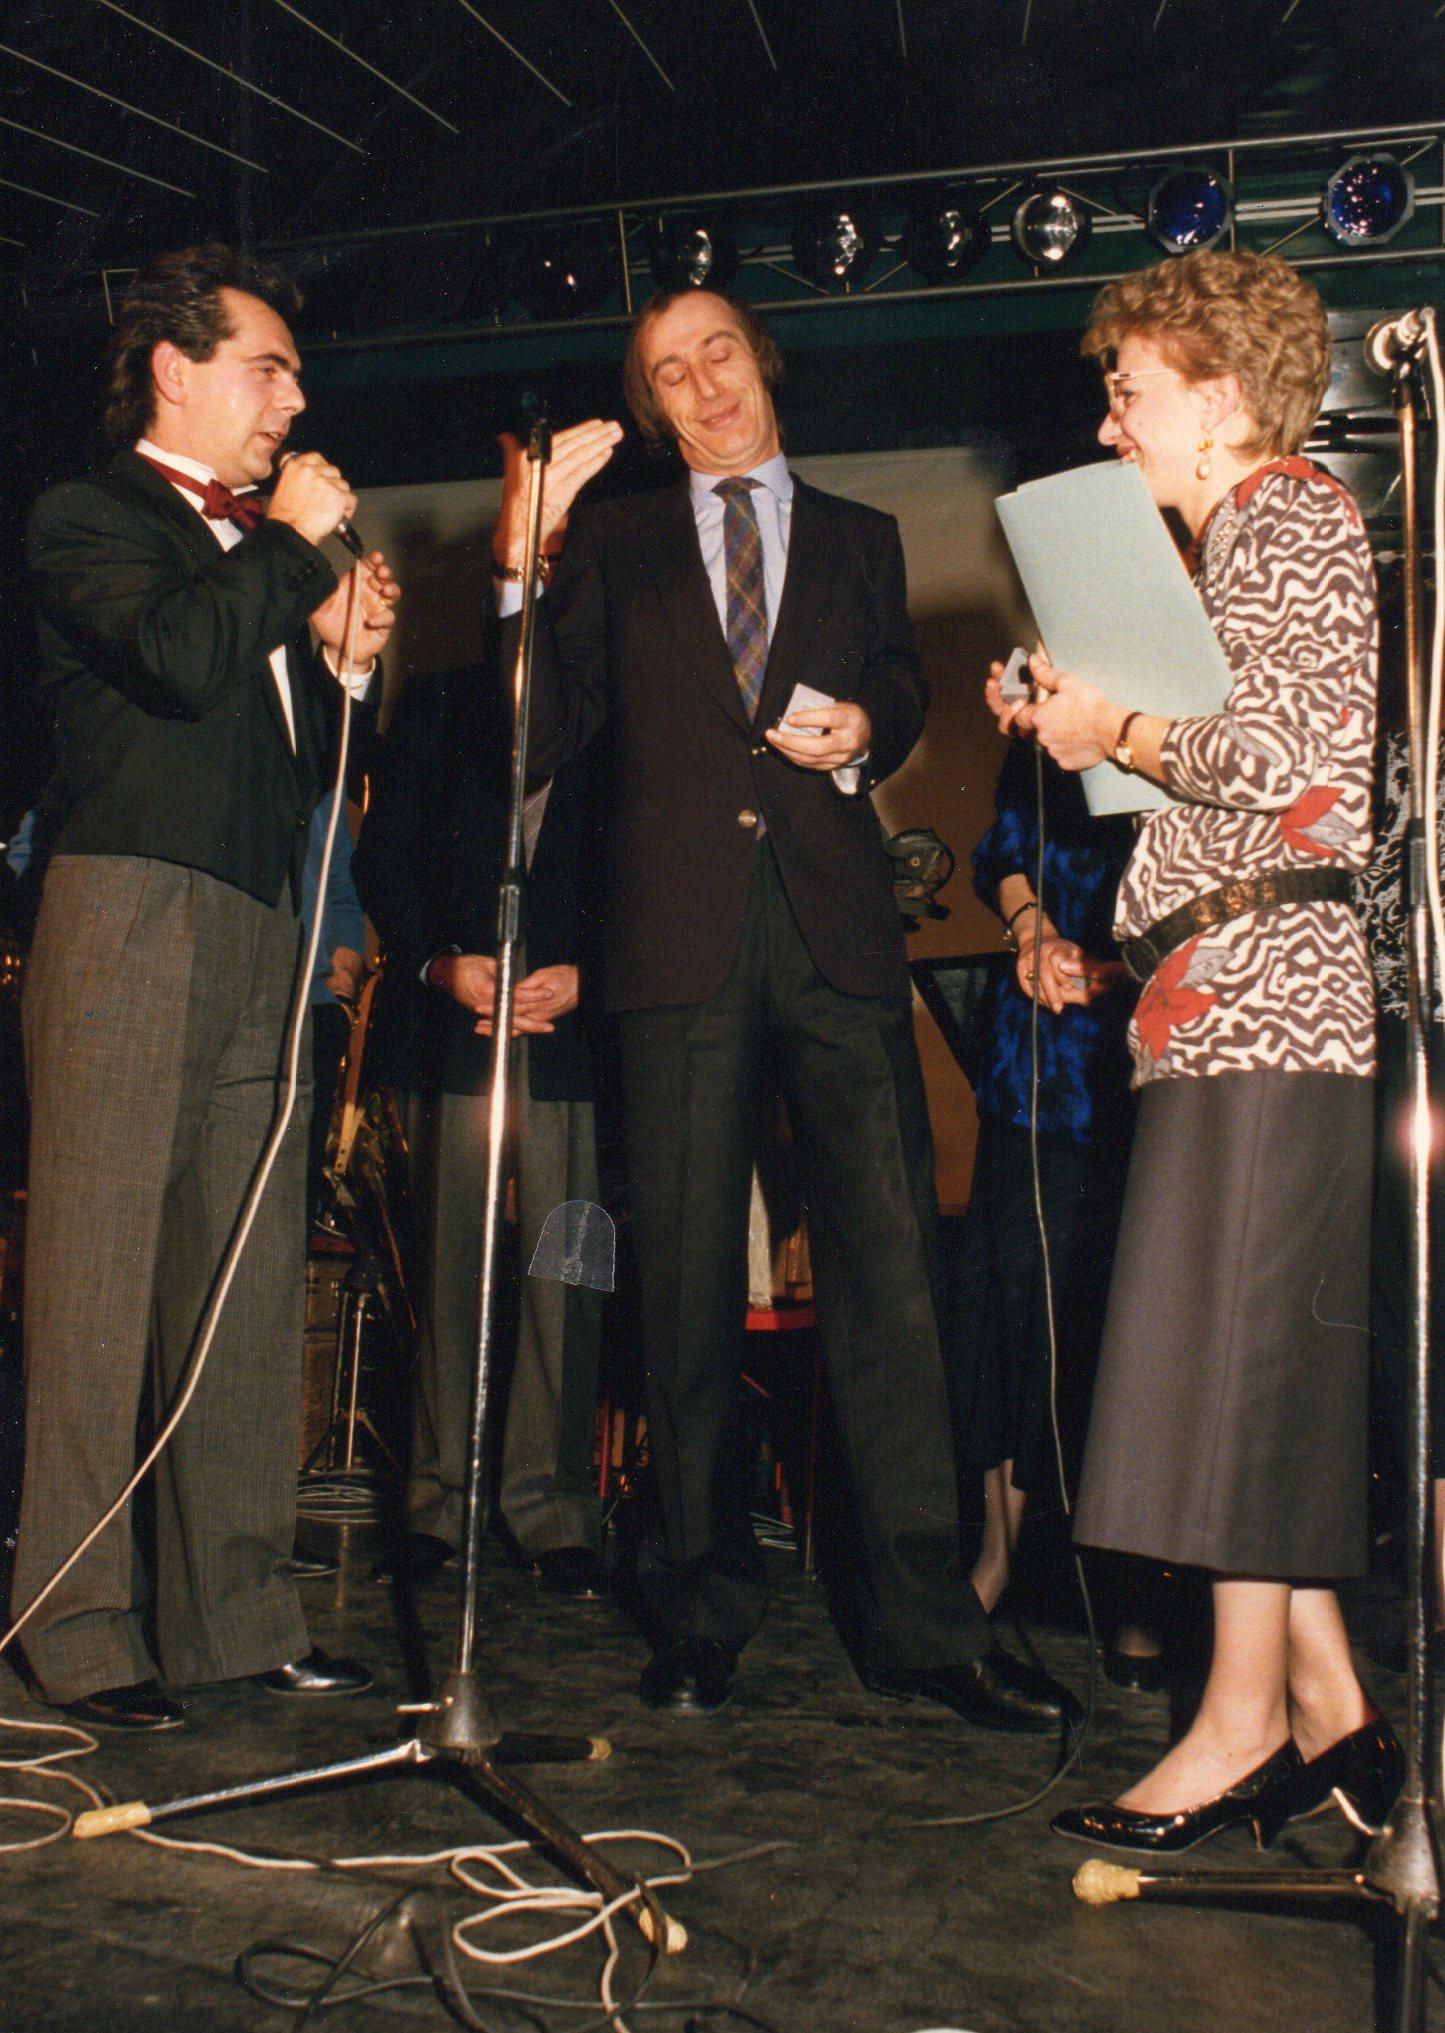 Festa Marabù 1987 - Silvano,Maurizio Vidoli e Silvia